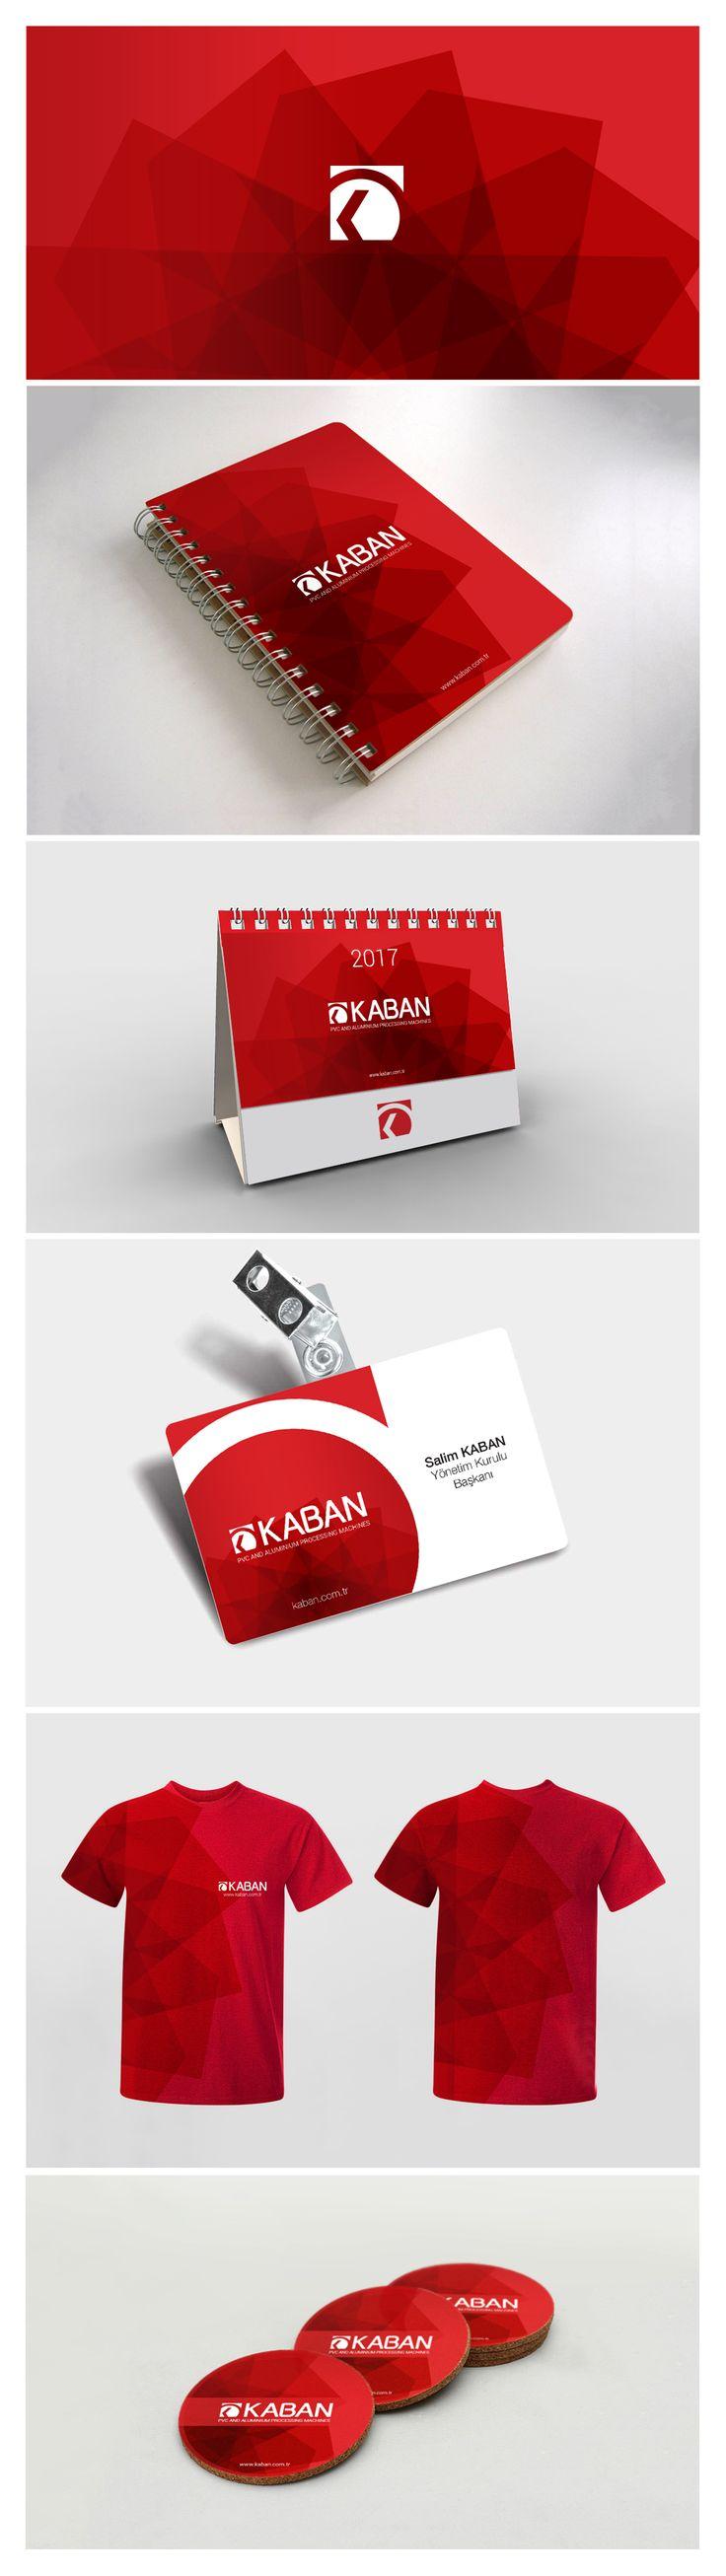 Kaban Machine / Corporate Design